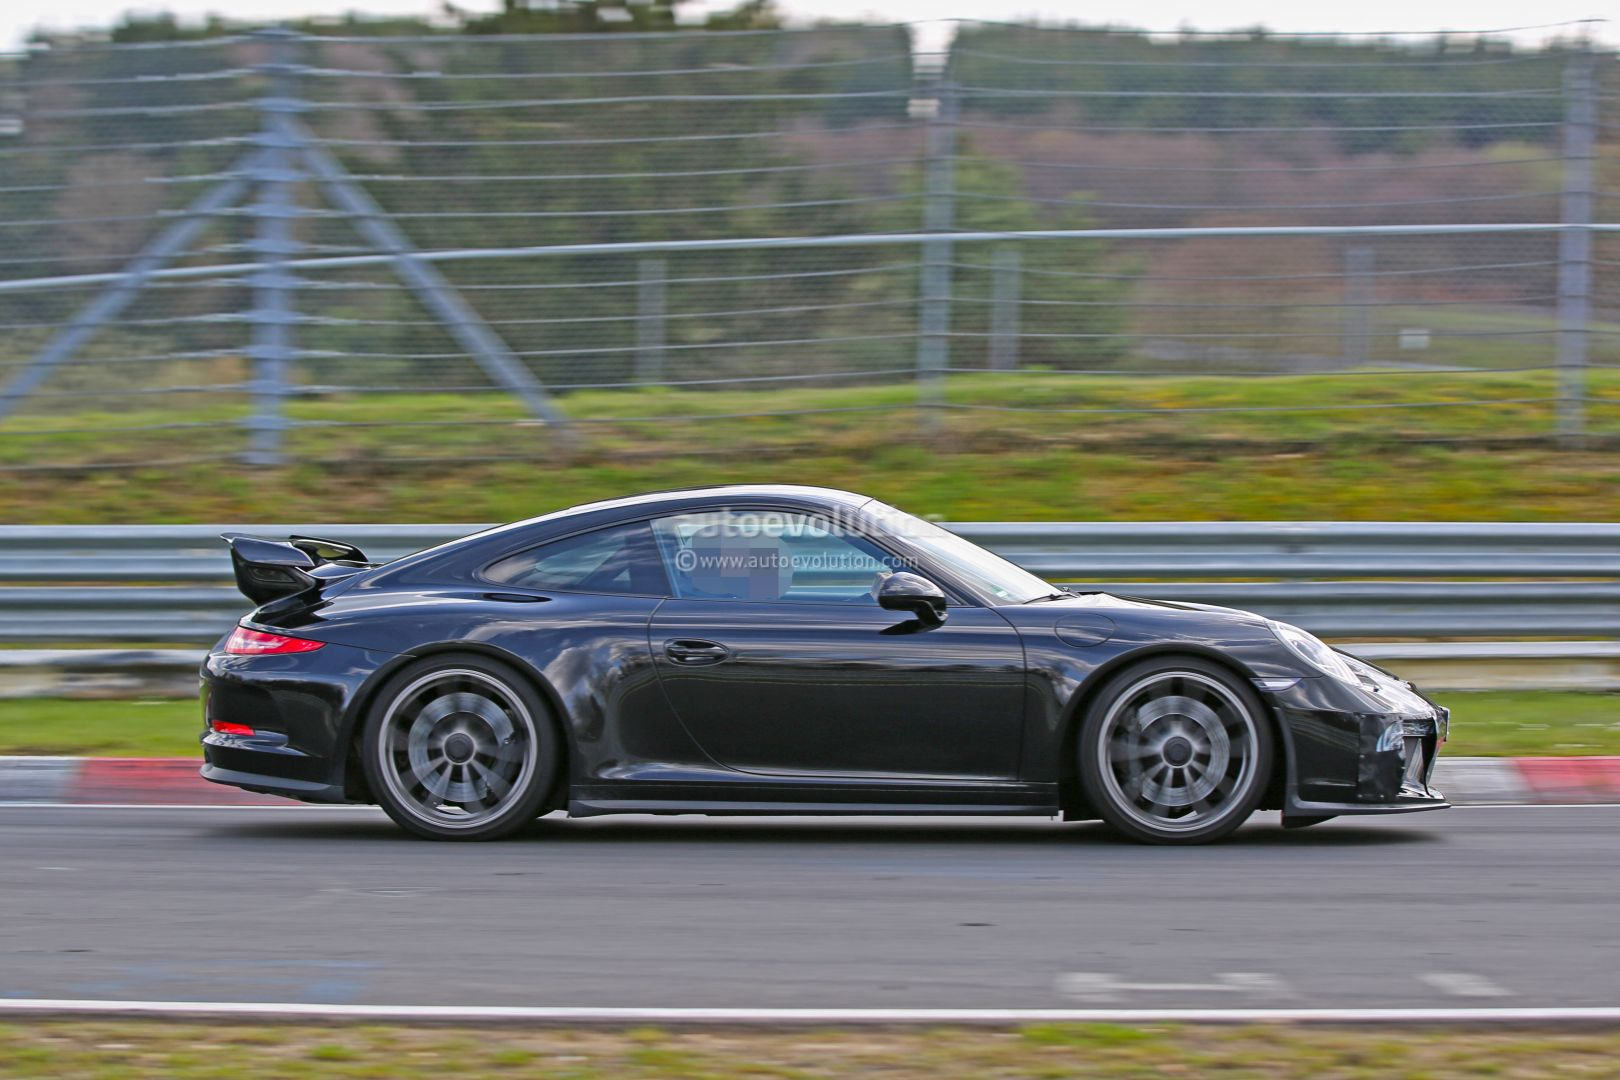 Porsche Test Driver Accelerates In 2017 911 Gt3 Facelift Soundtrack